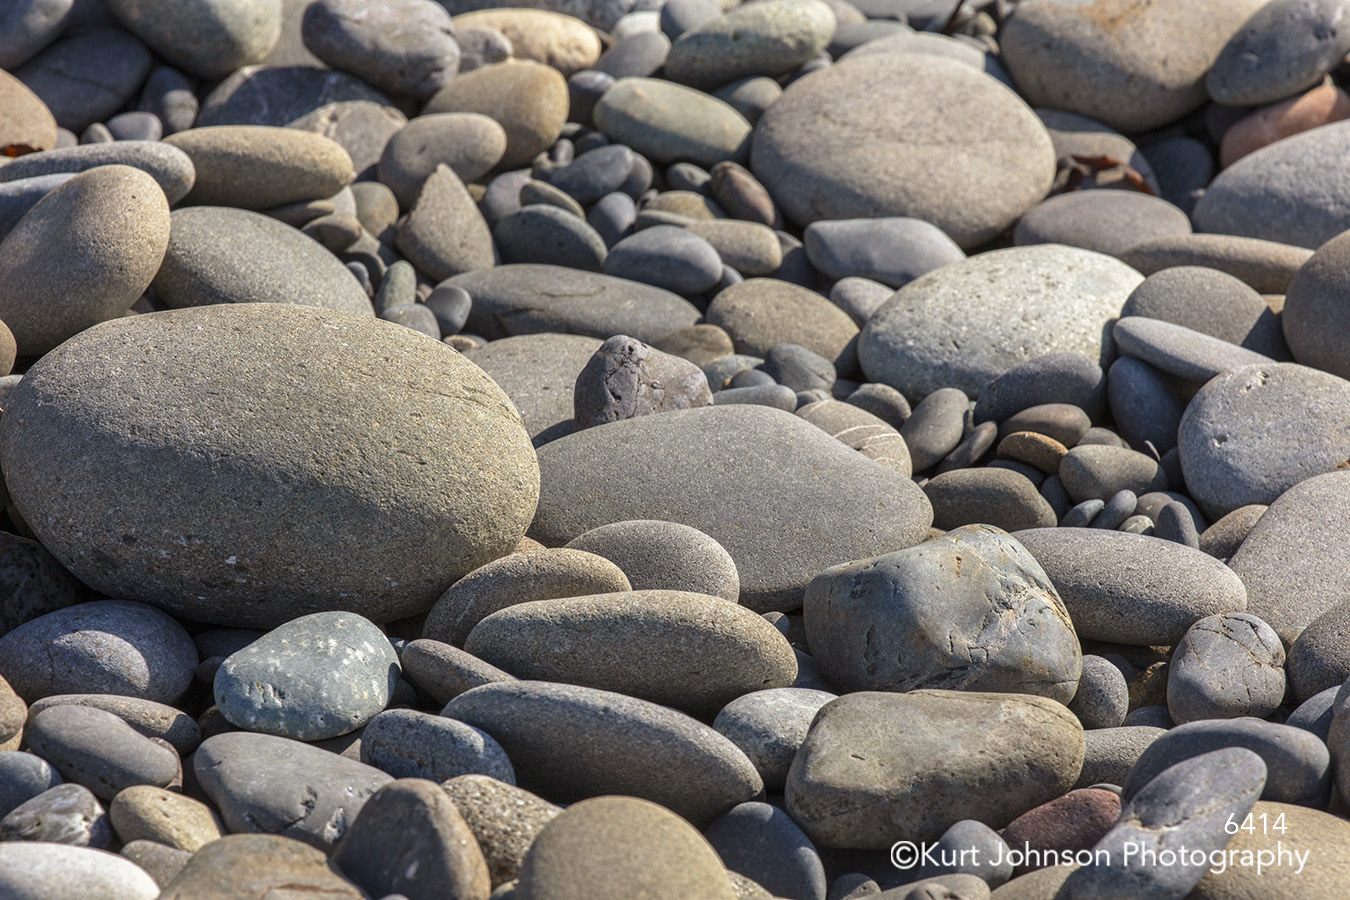 rocks stone beach shore texture textures gray rock stones